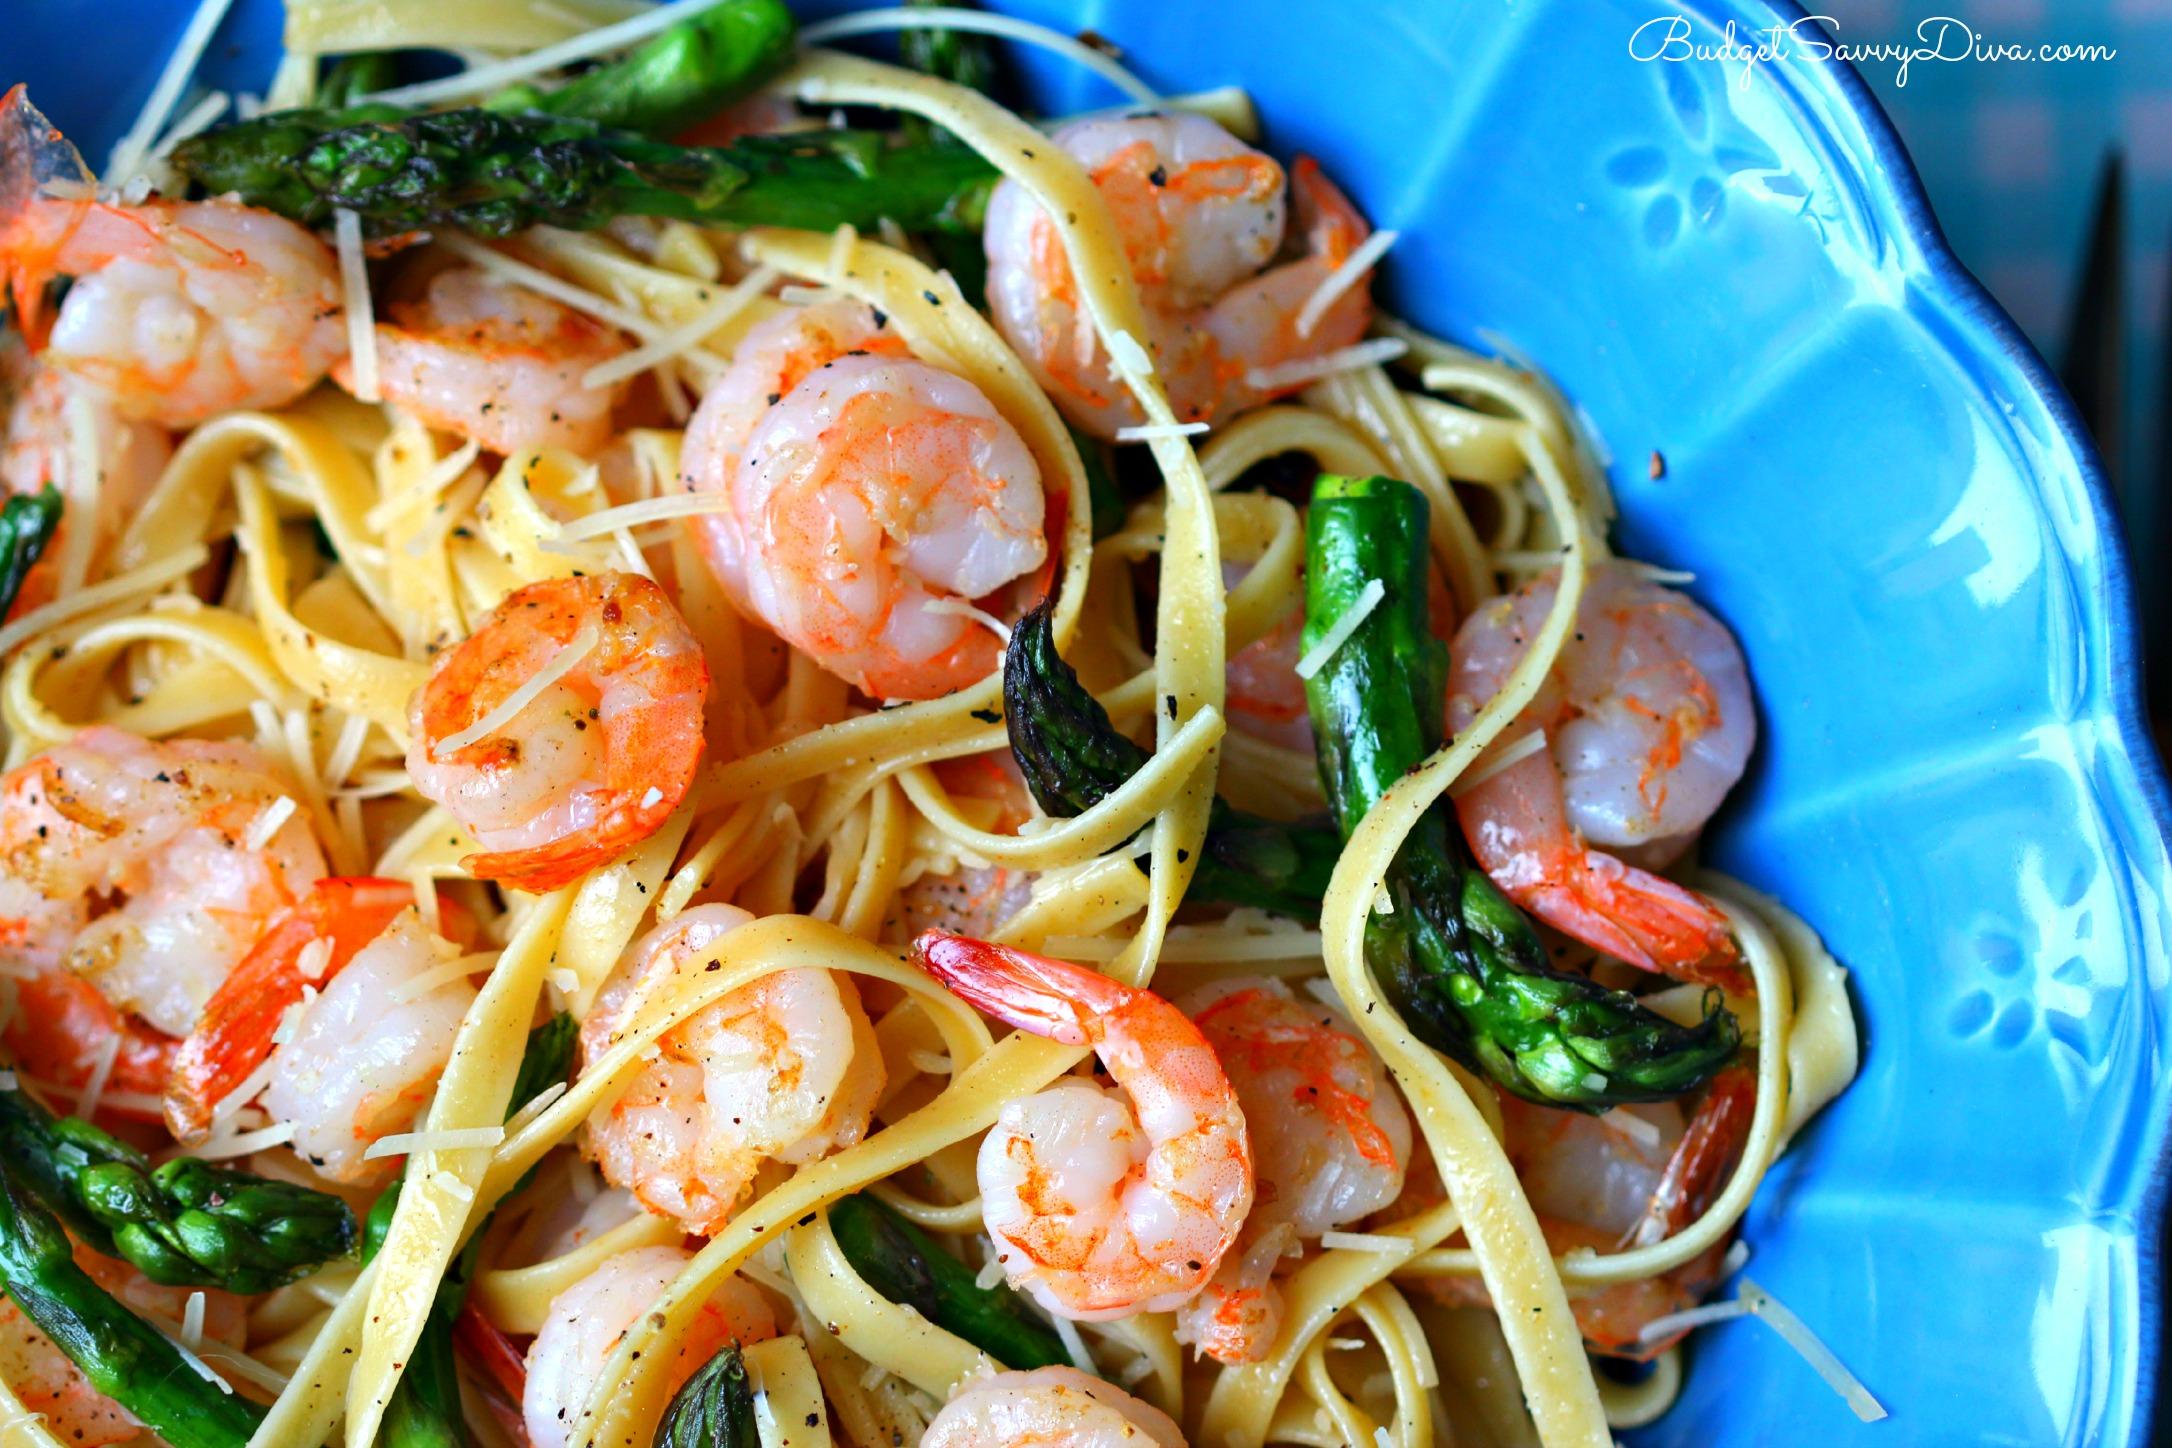 Noble Asparagus Fettuccine Recipe Easy Shrimp Easy Shrimp Asparagus Fettuccine Recipe Budget Savvy Diva Shrimp Asparagus Pasta Giada Shrimp Asparagus Pasta Healthy nice food Shrimp Asparagus Pasta